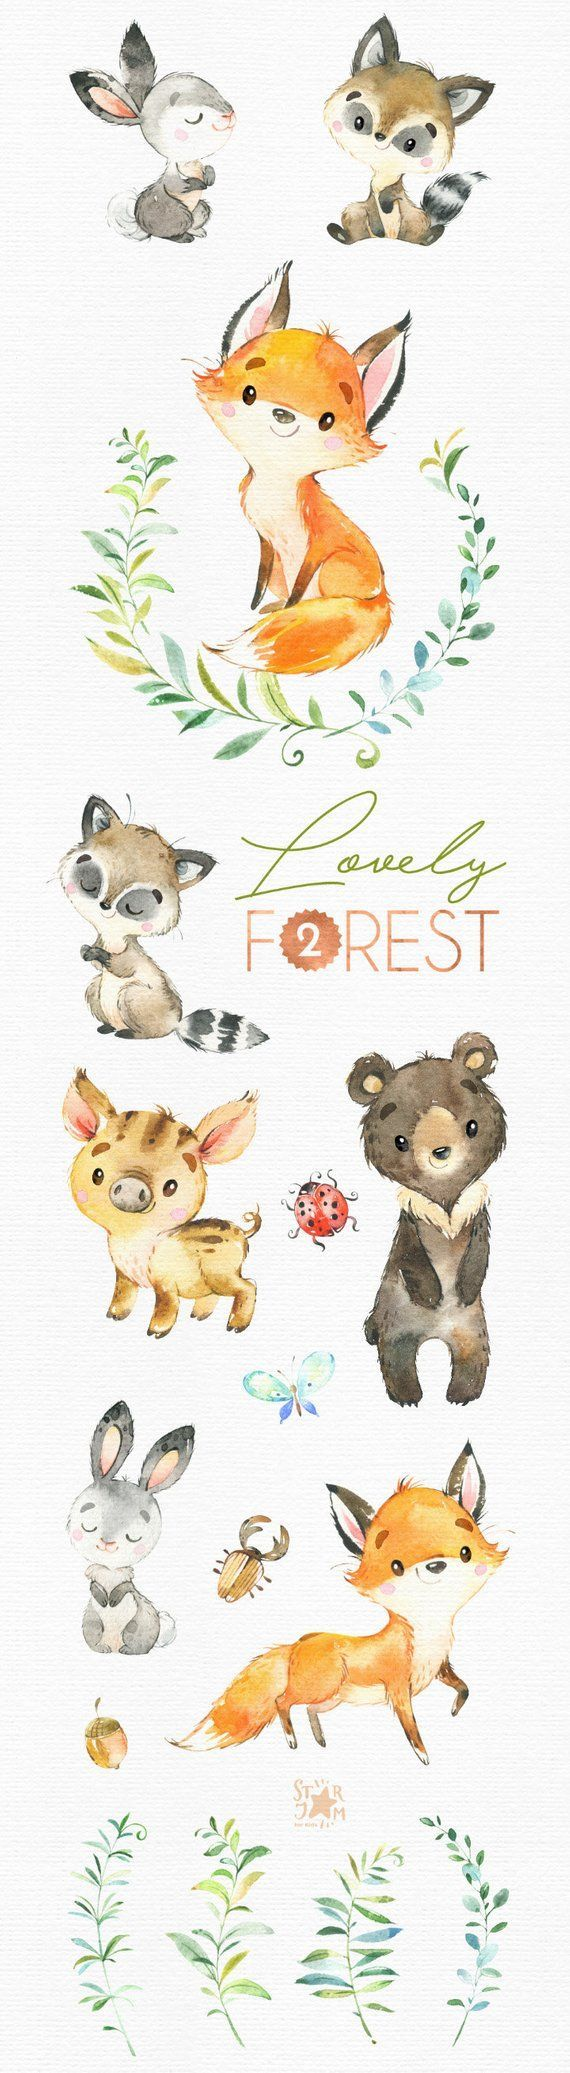 Beautiful Forest 2. Small Animals Clip Art, Watercolor, Fox, Boar, Bear, Rabbit, Raccoon, Flowers, Wreaths, Babyshower, Forest